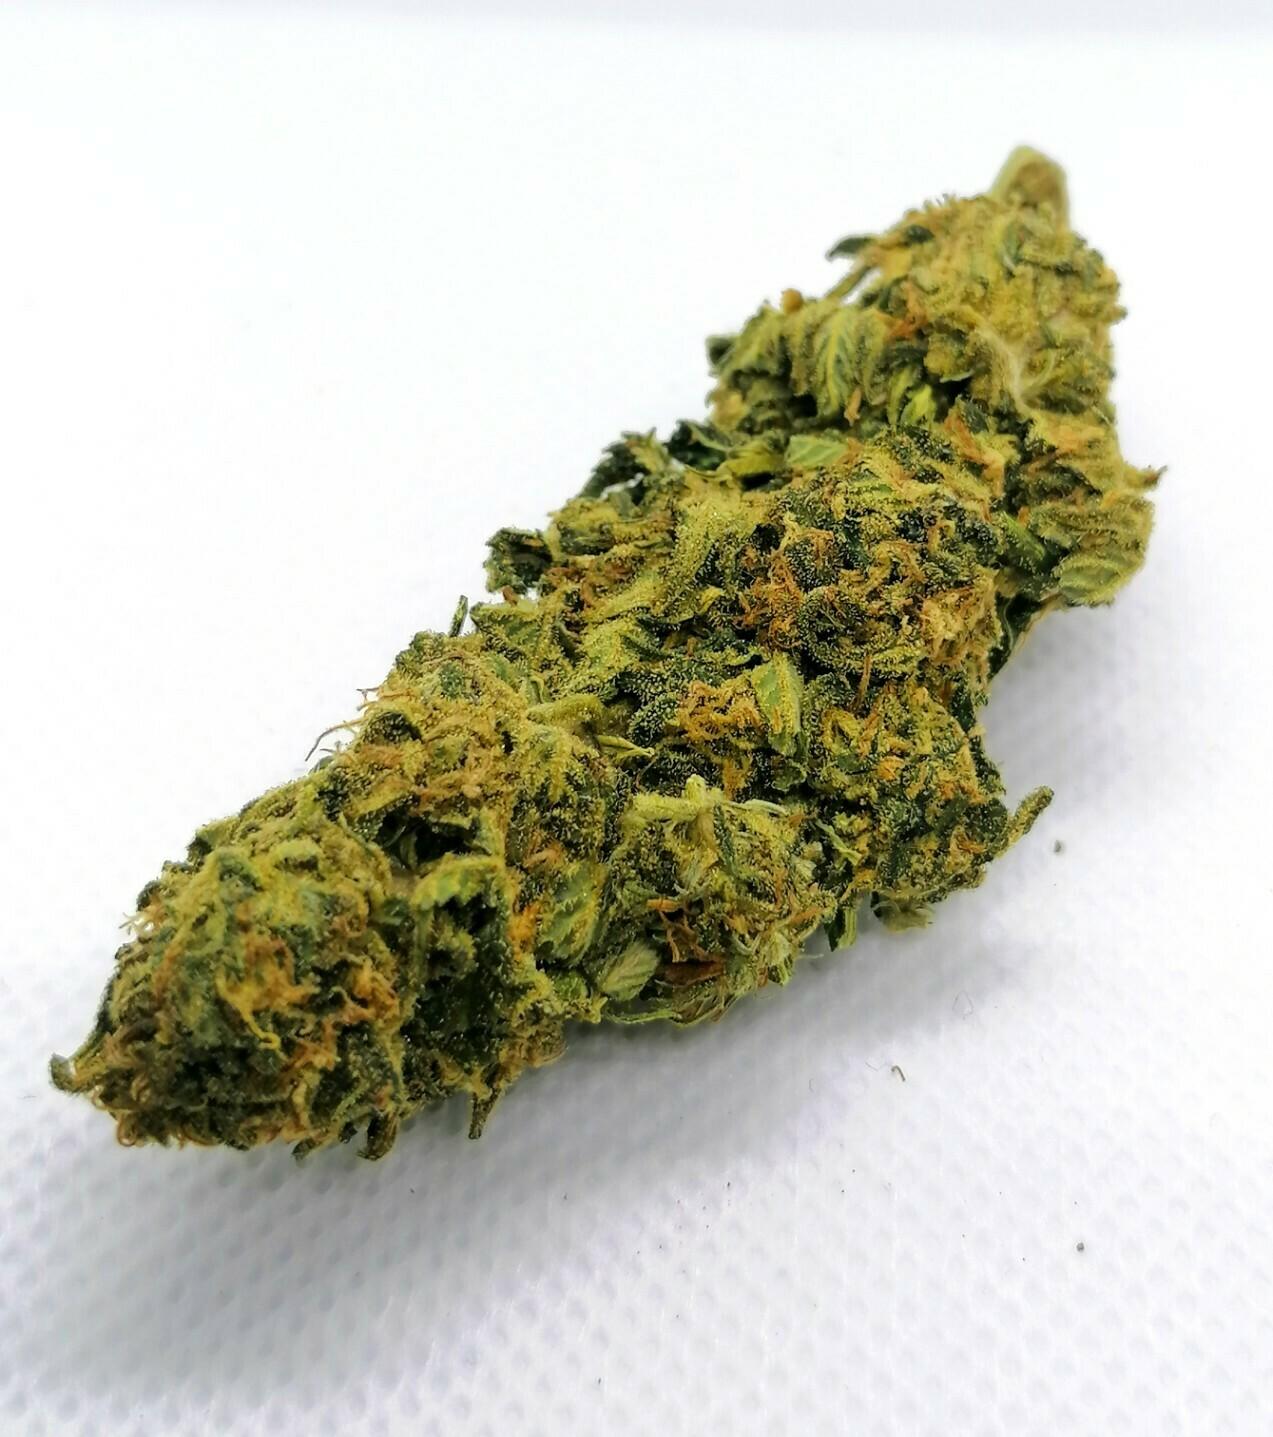 Cannabis light - cannatonic